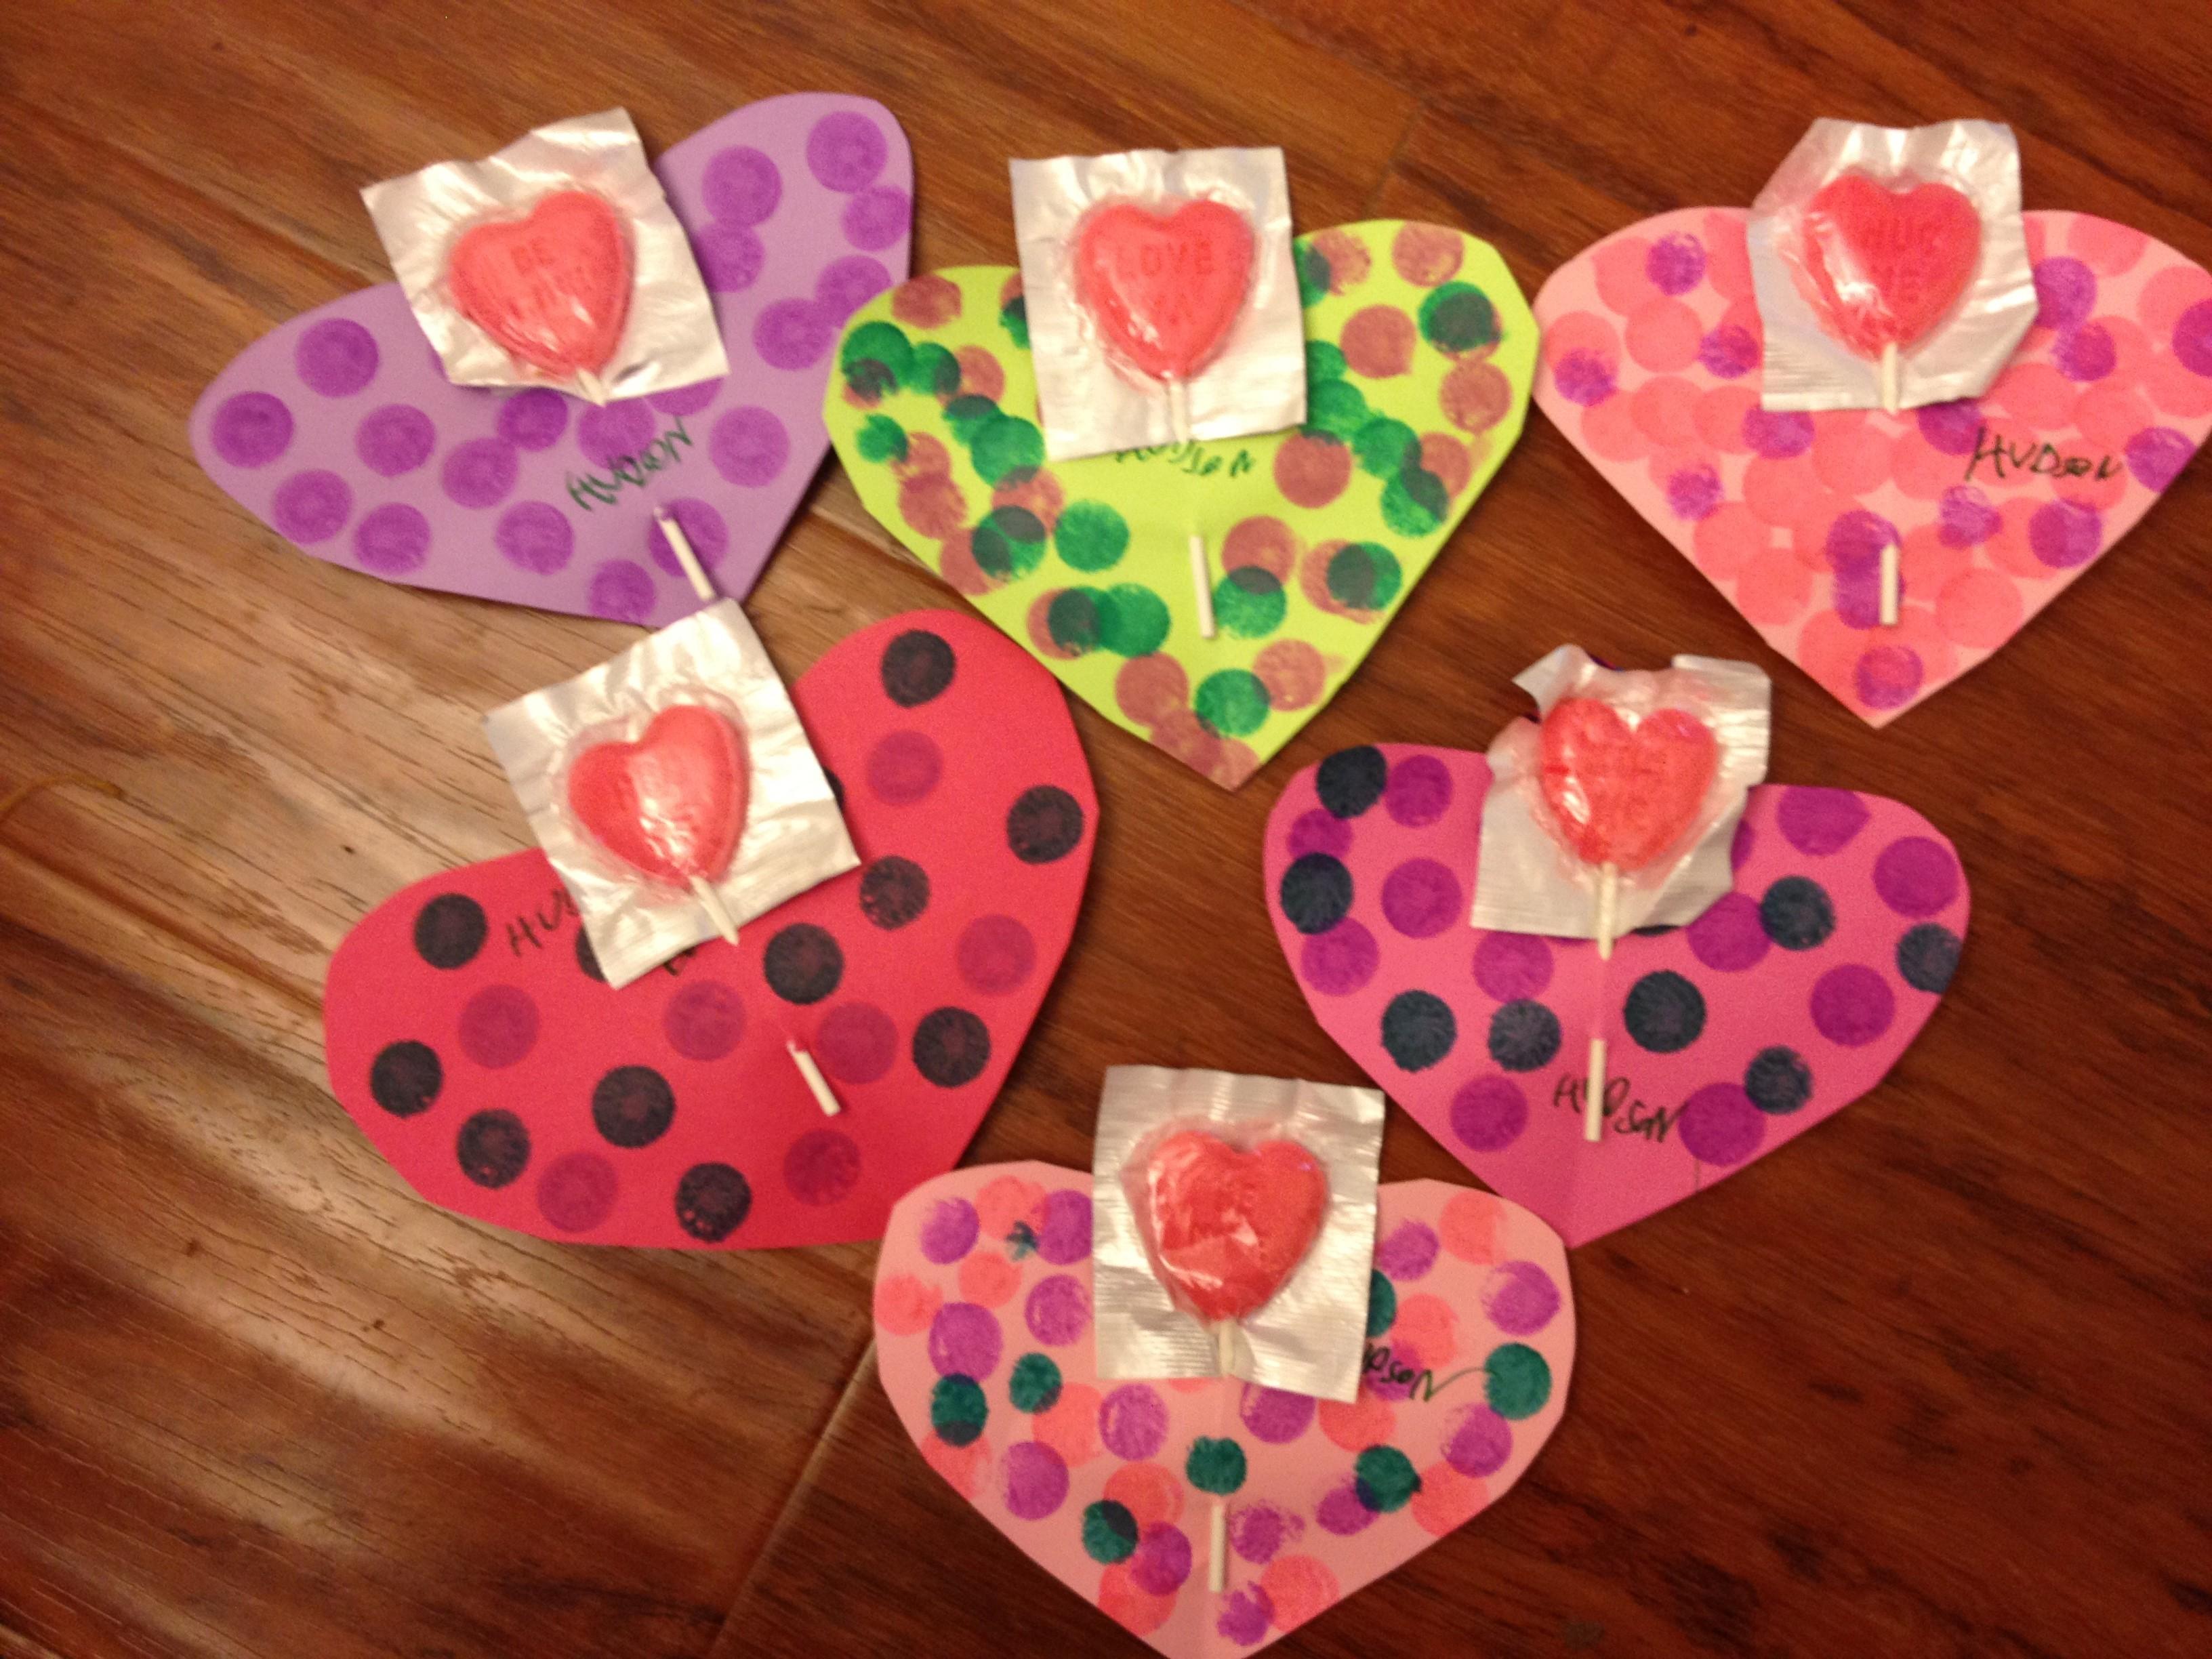 IMG 1510 e1328904310244 - Valentines Craft For Kindergarten